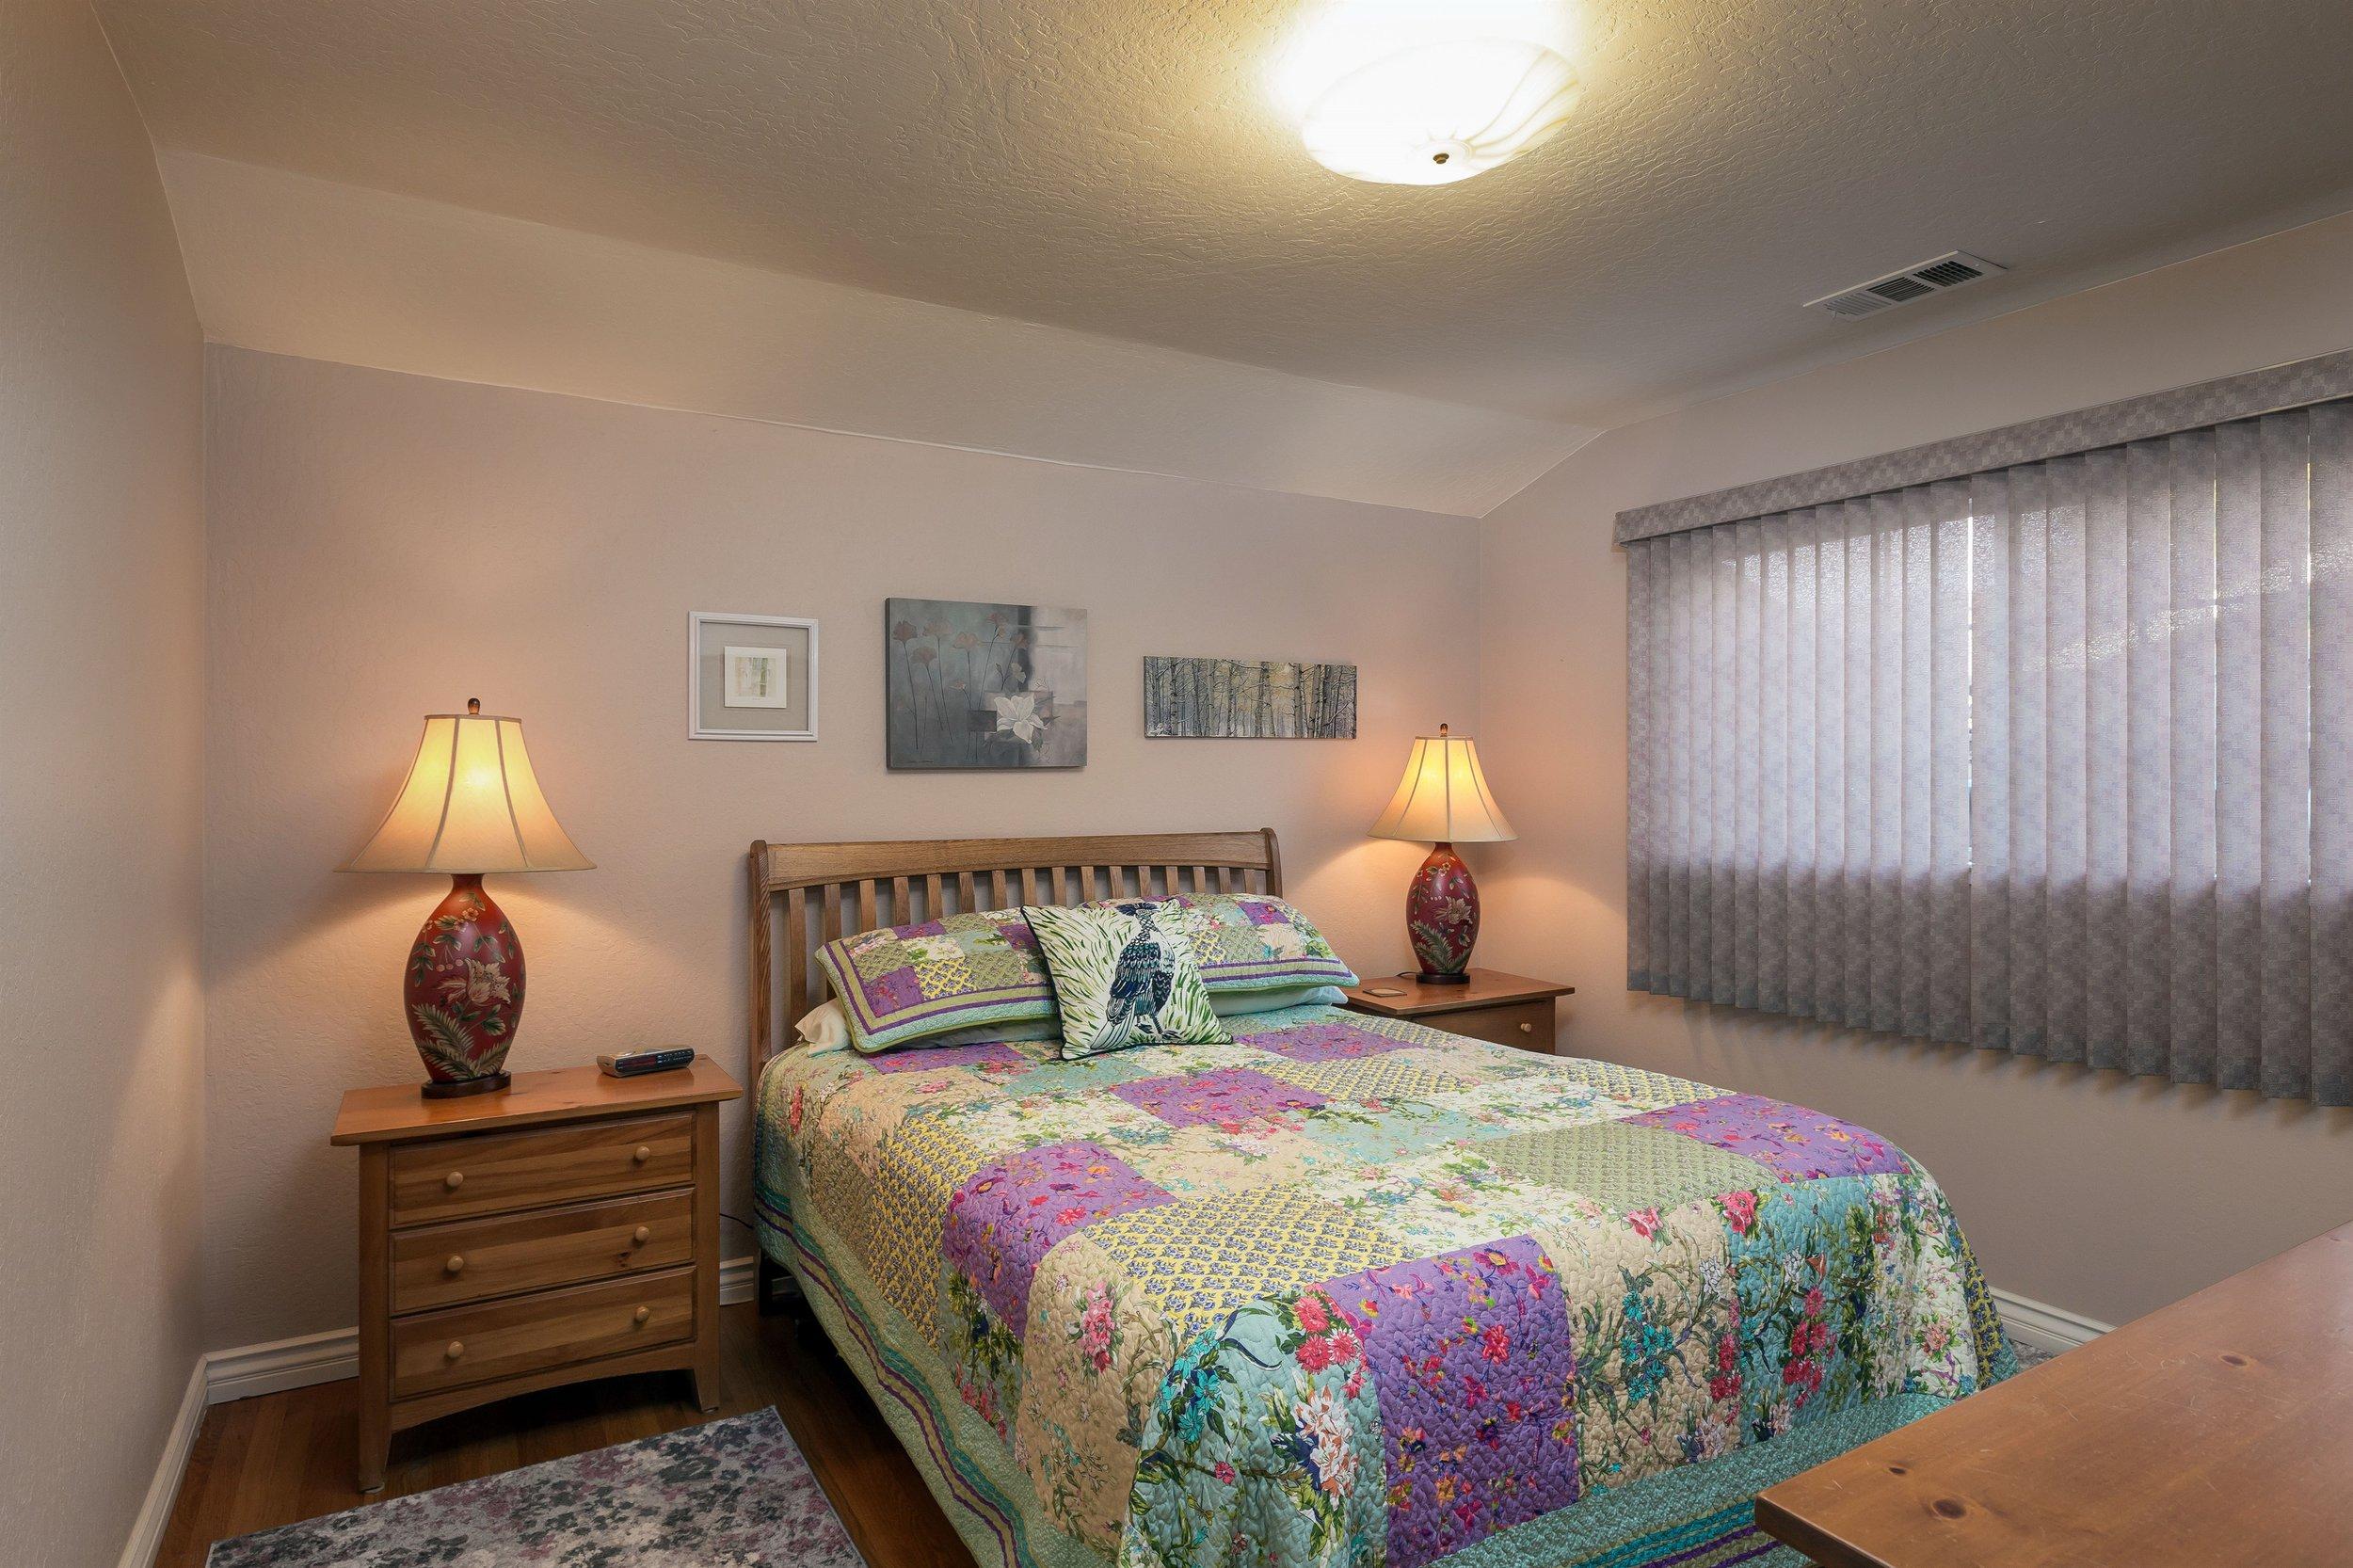 022_Bedroom (1).jpg